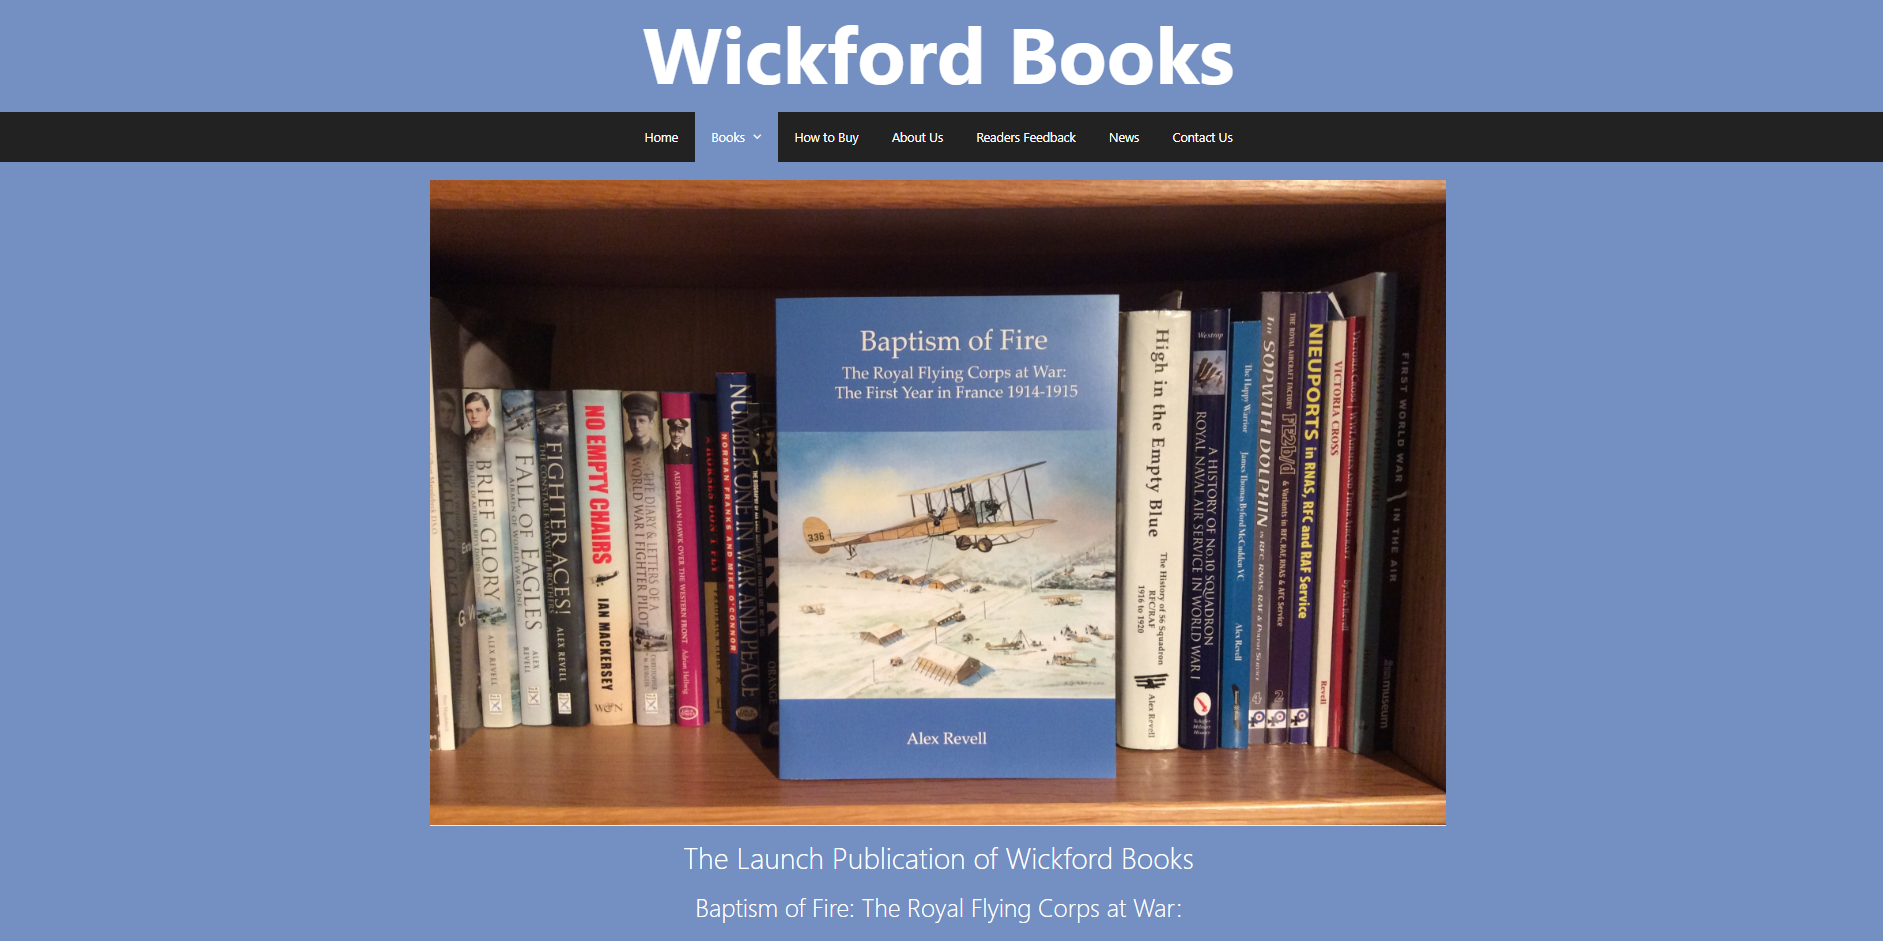 Wickford Books